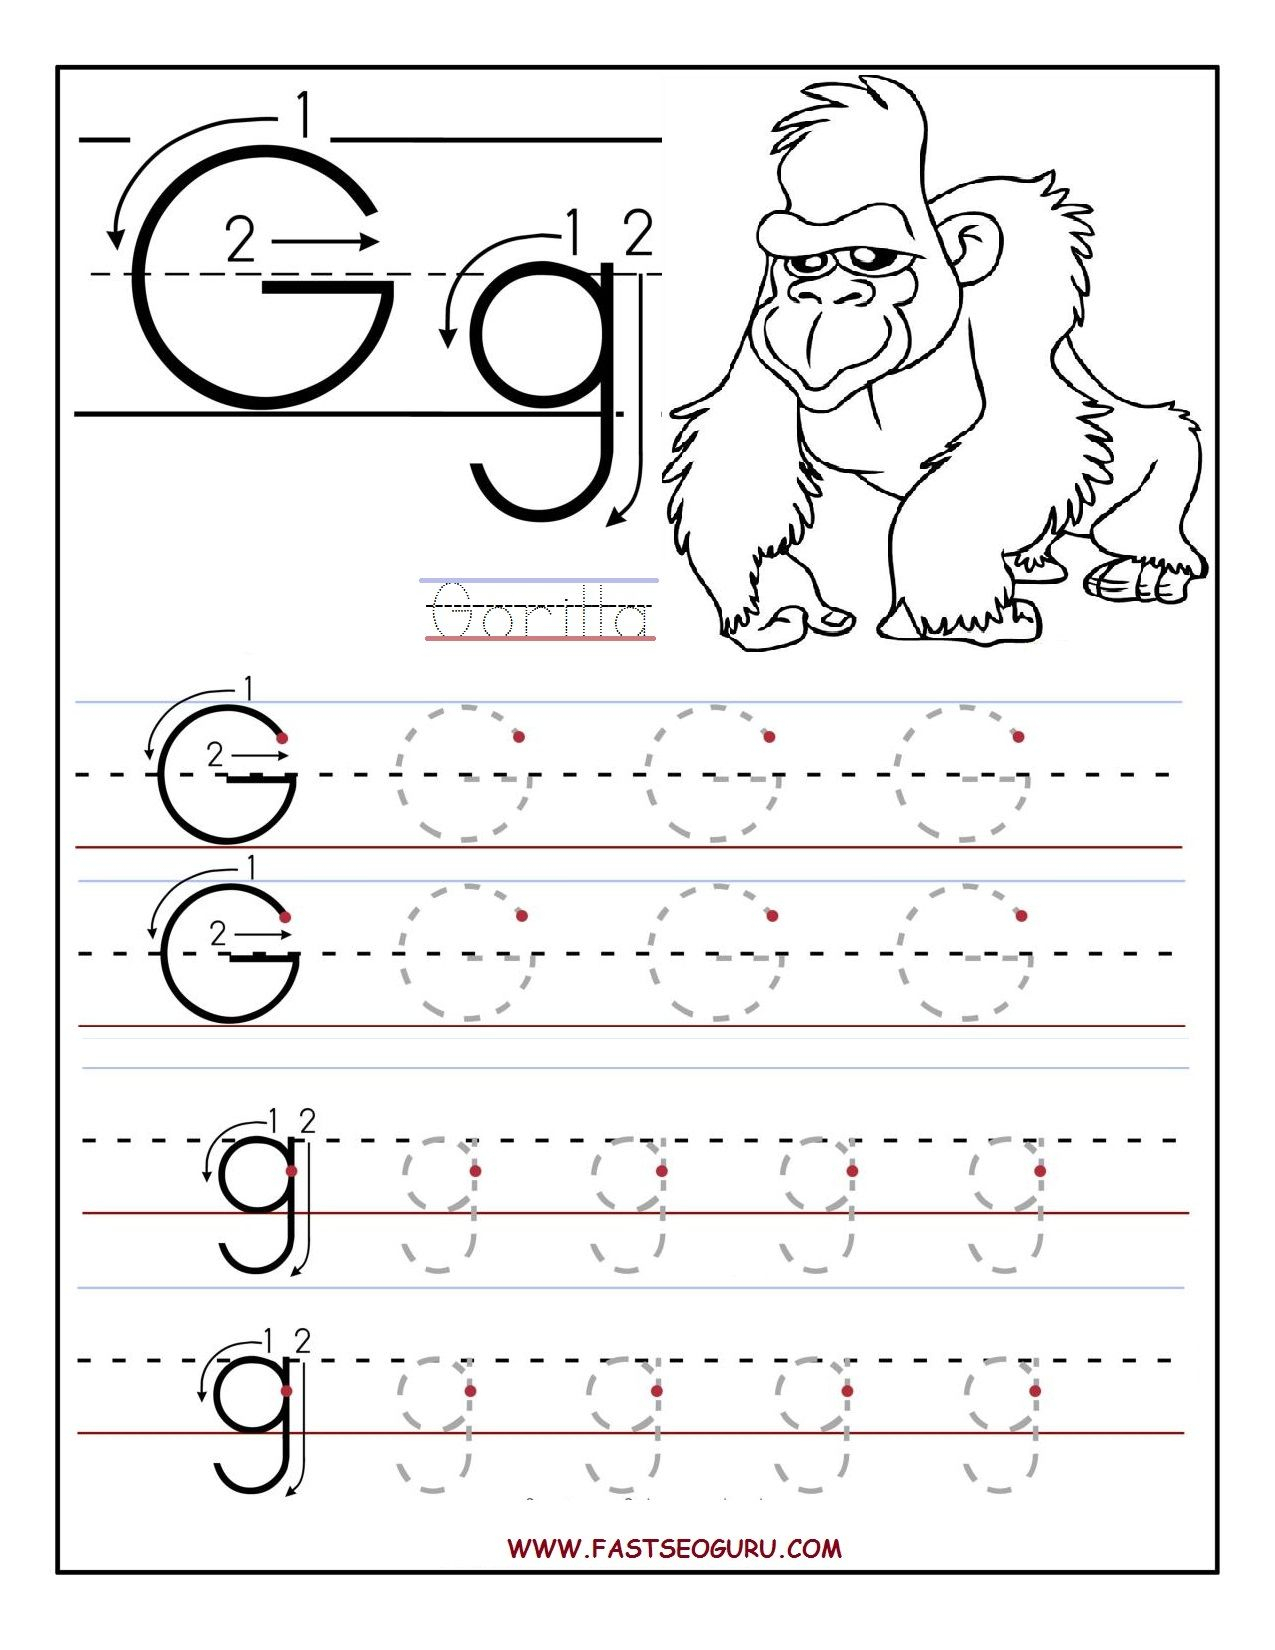 Worksheets For Preschoolers | Printable Letter G Tracing throughout Alphabet G Worksheets